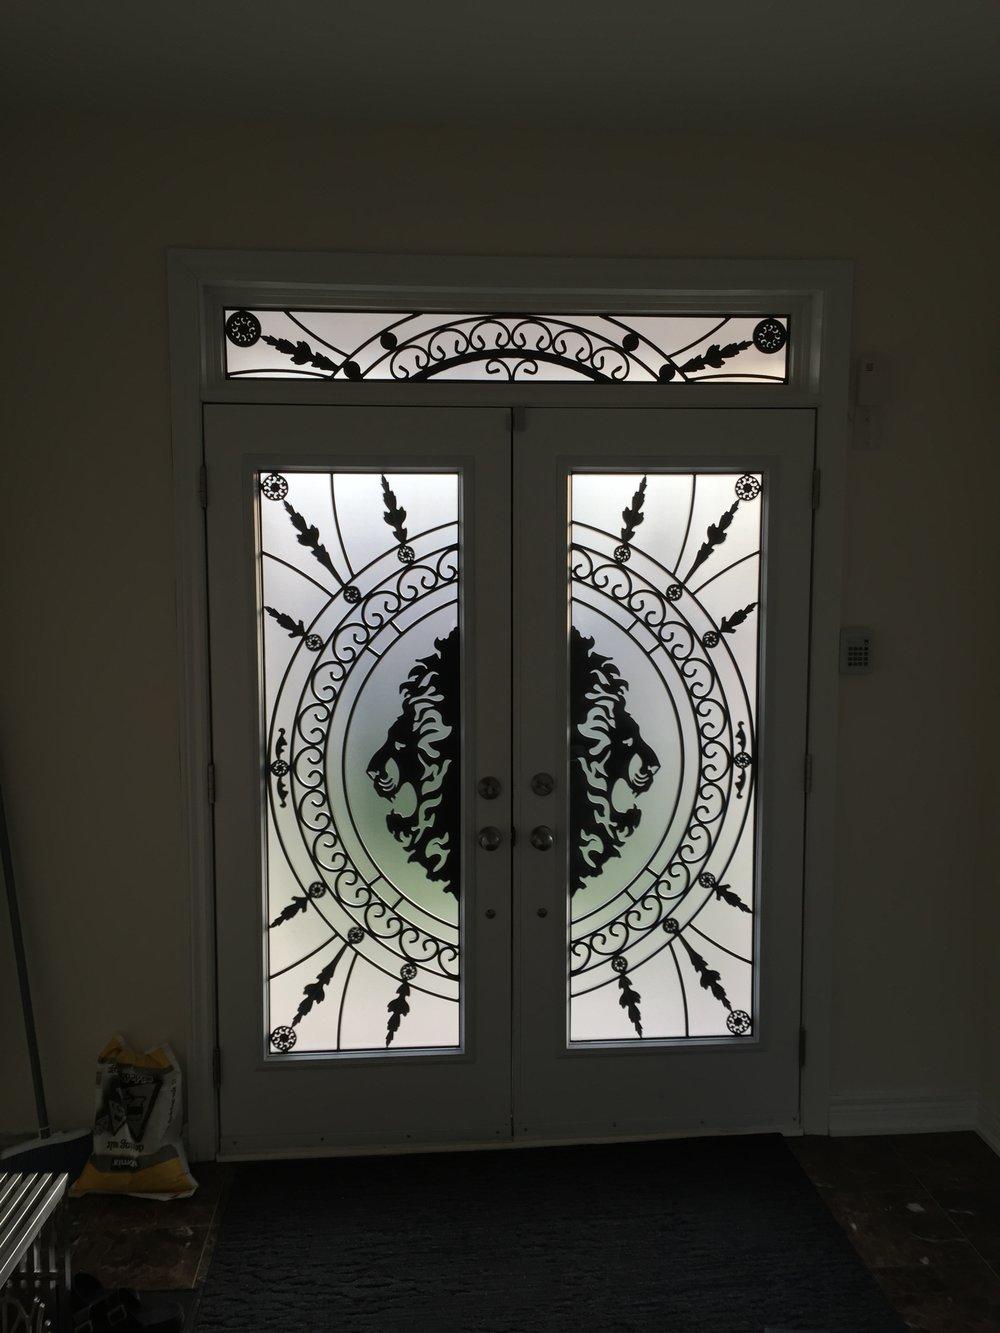 Forest-King-Wrought-Iron-Glass-Door-Inserts-Brampton-Ontario